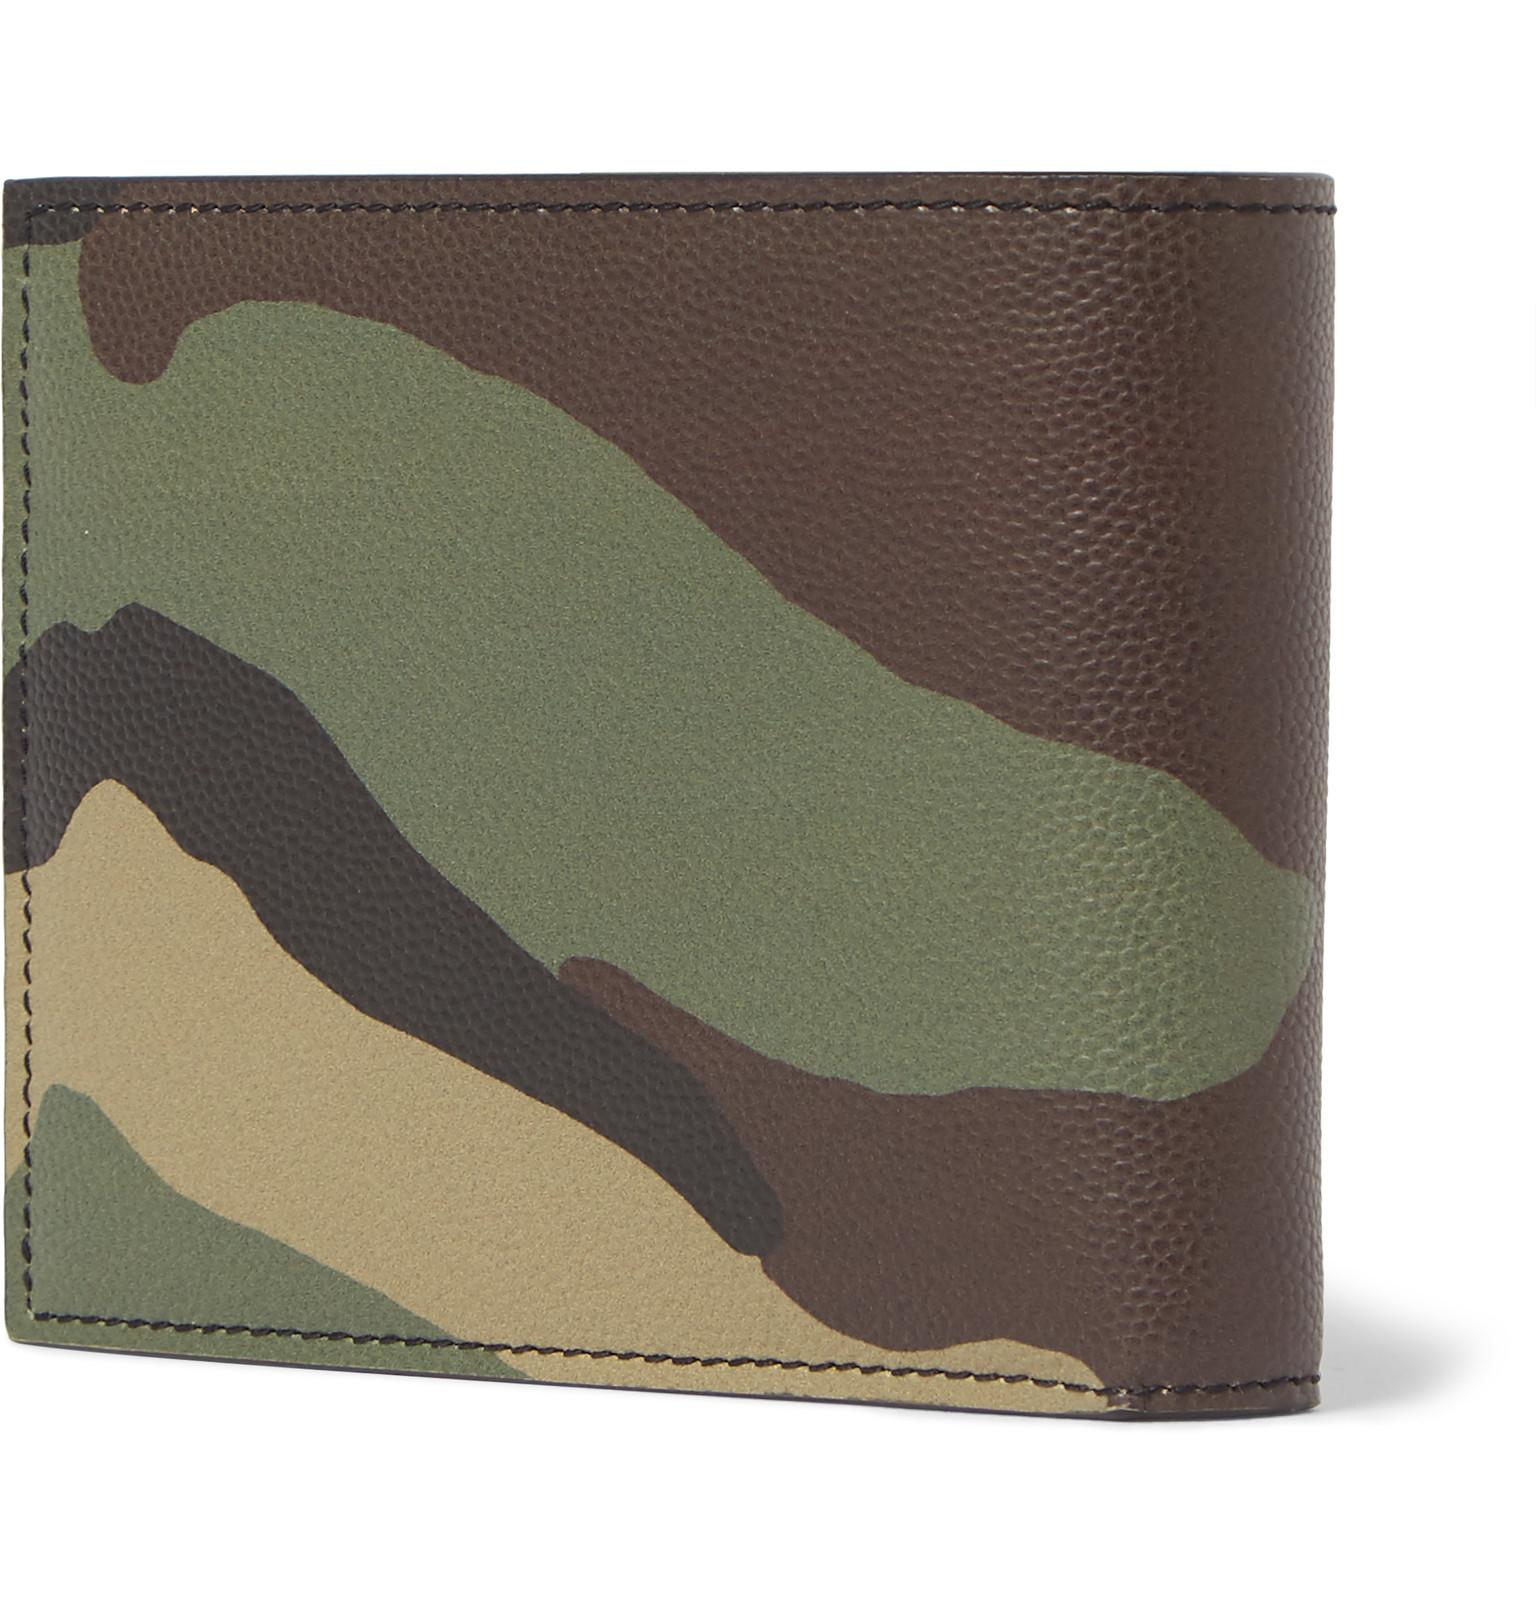 f7ad6a7b020 Saint Laurent Camouflage-print Pebble-grain Leather Billfold Wallet ...